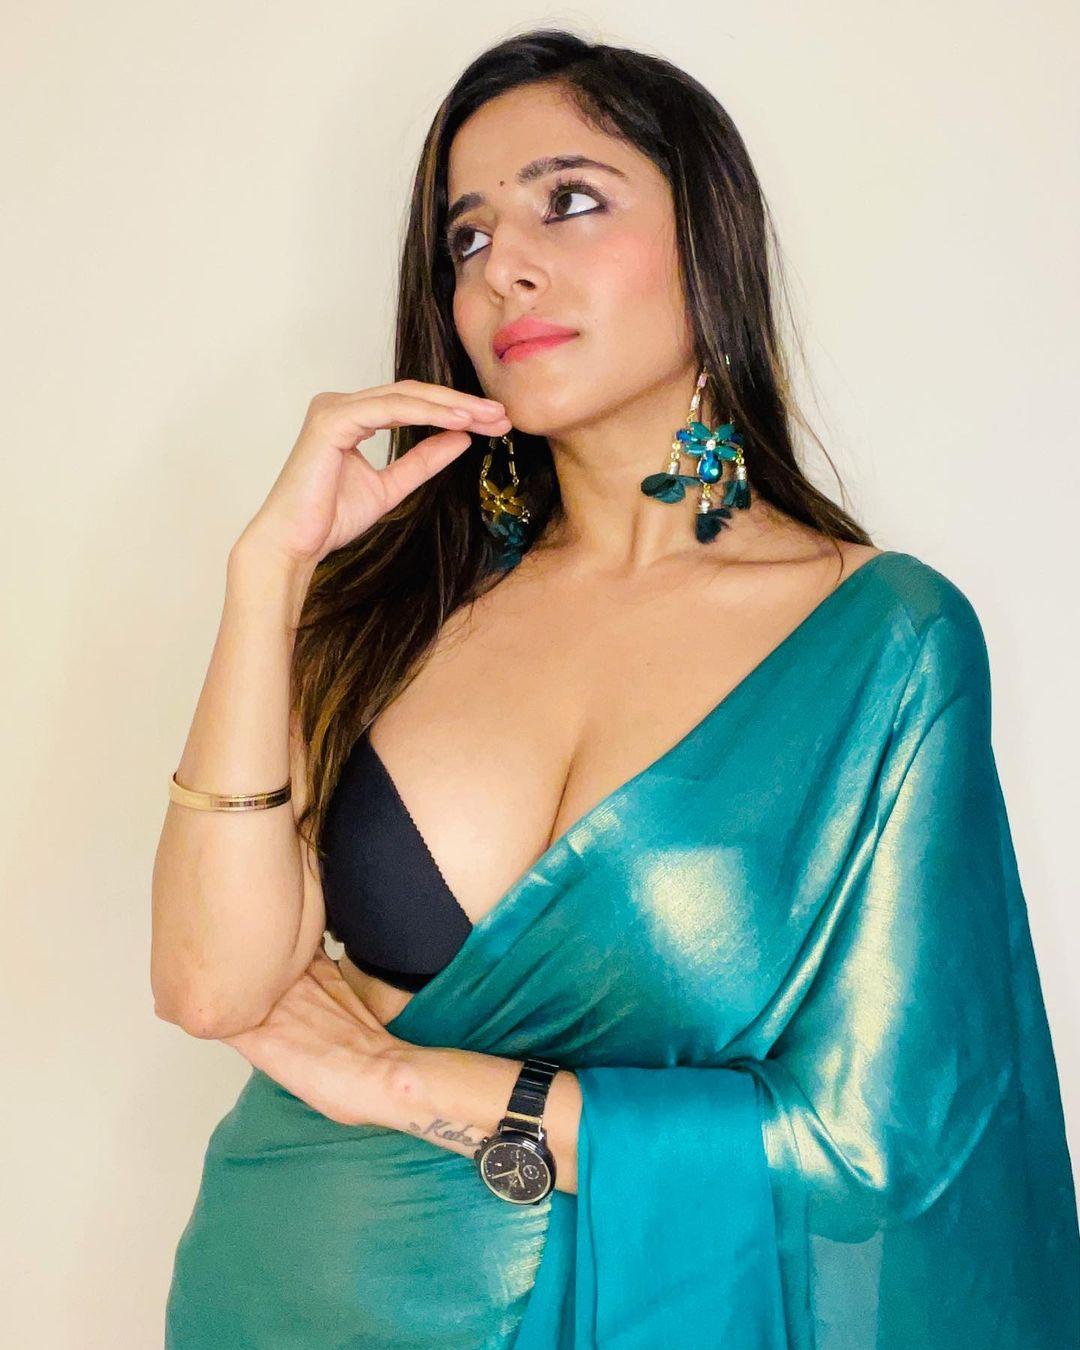 Kate Sharma Hot Images Boom on Instagram